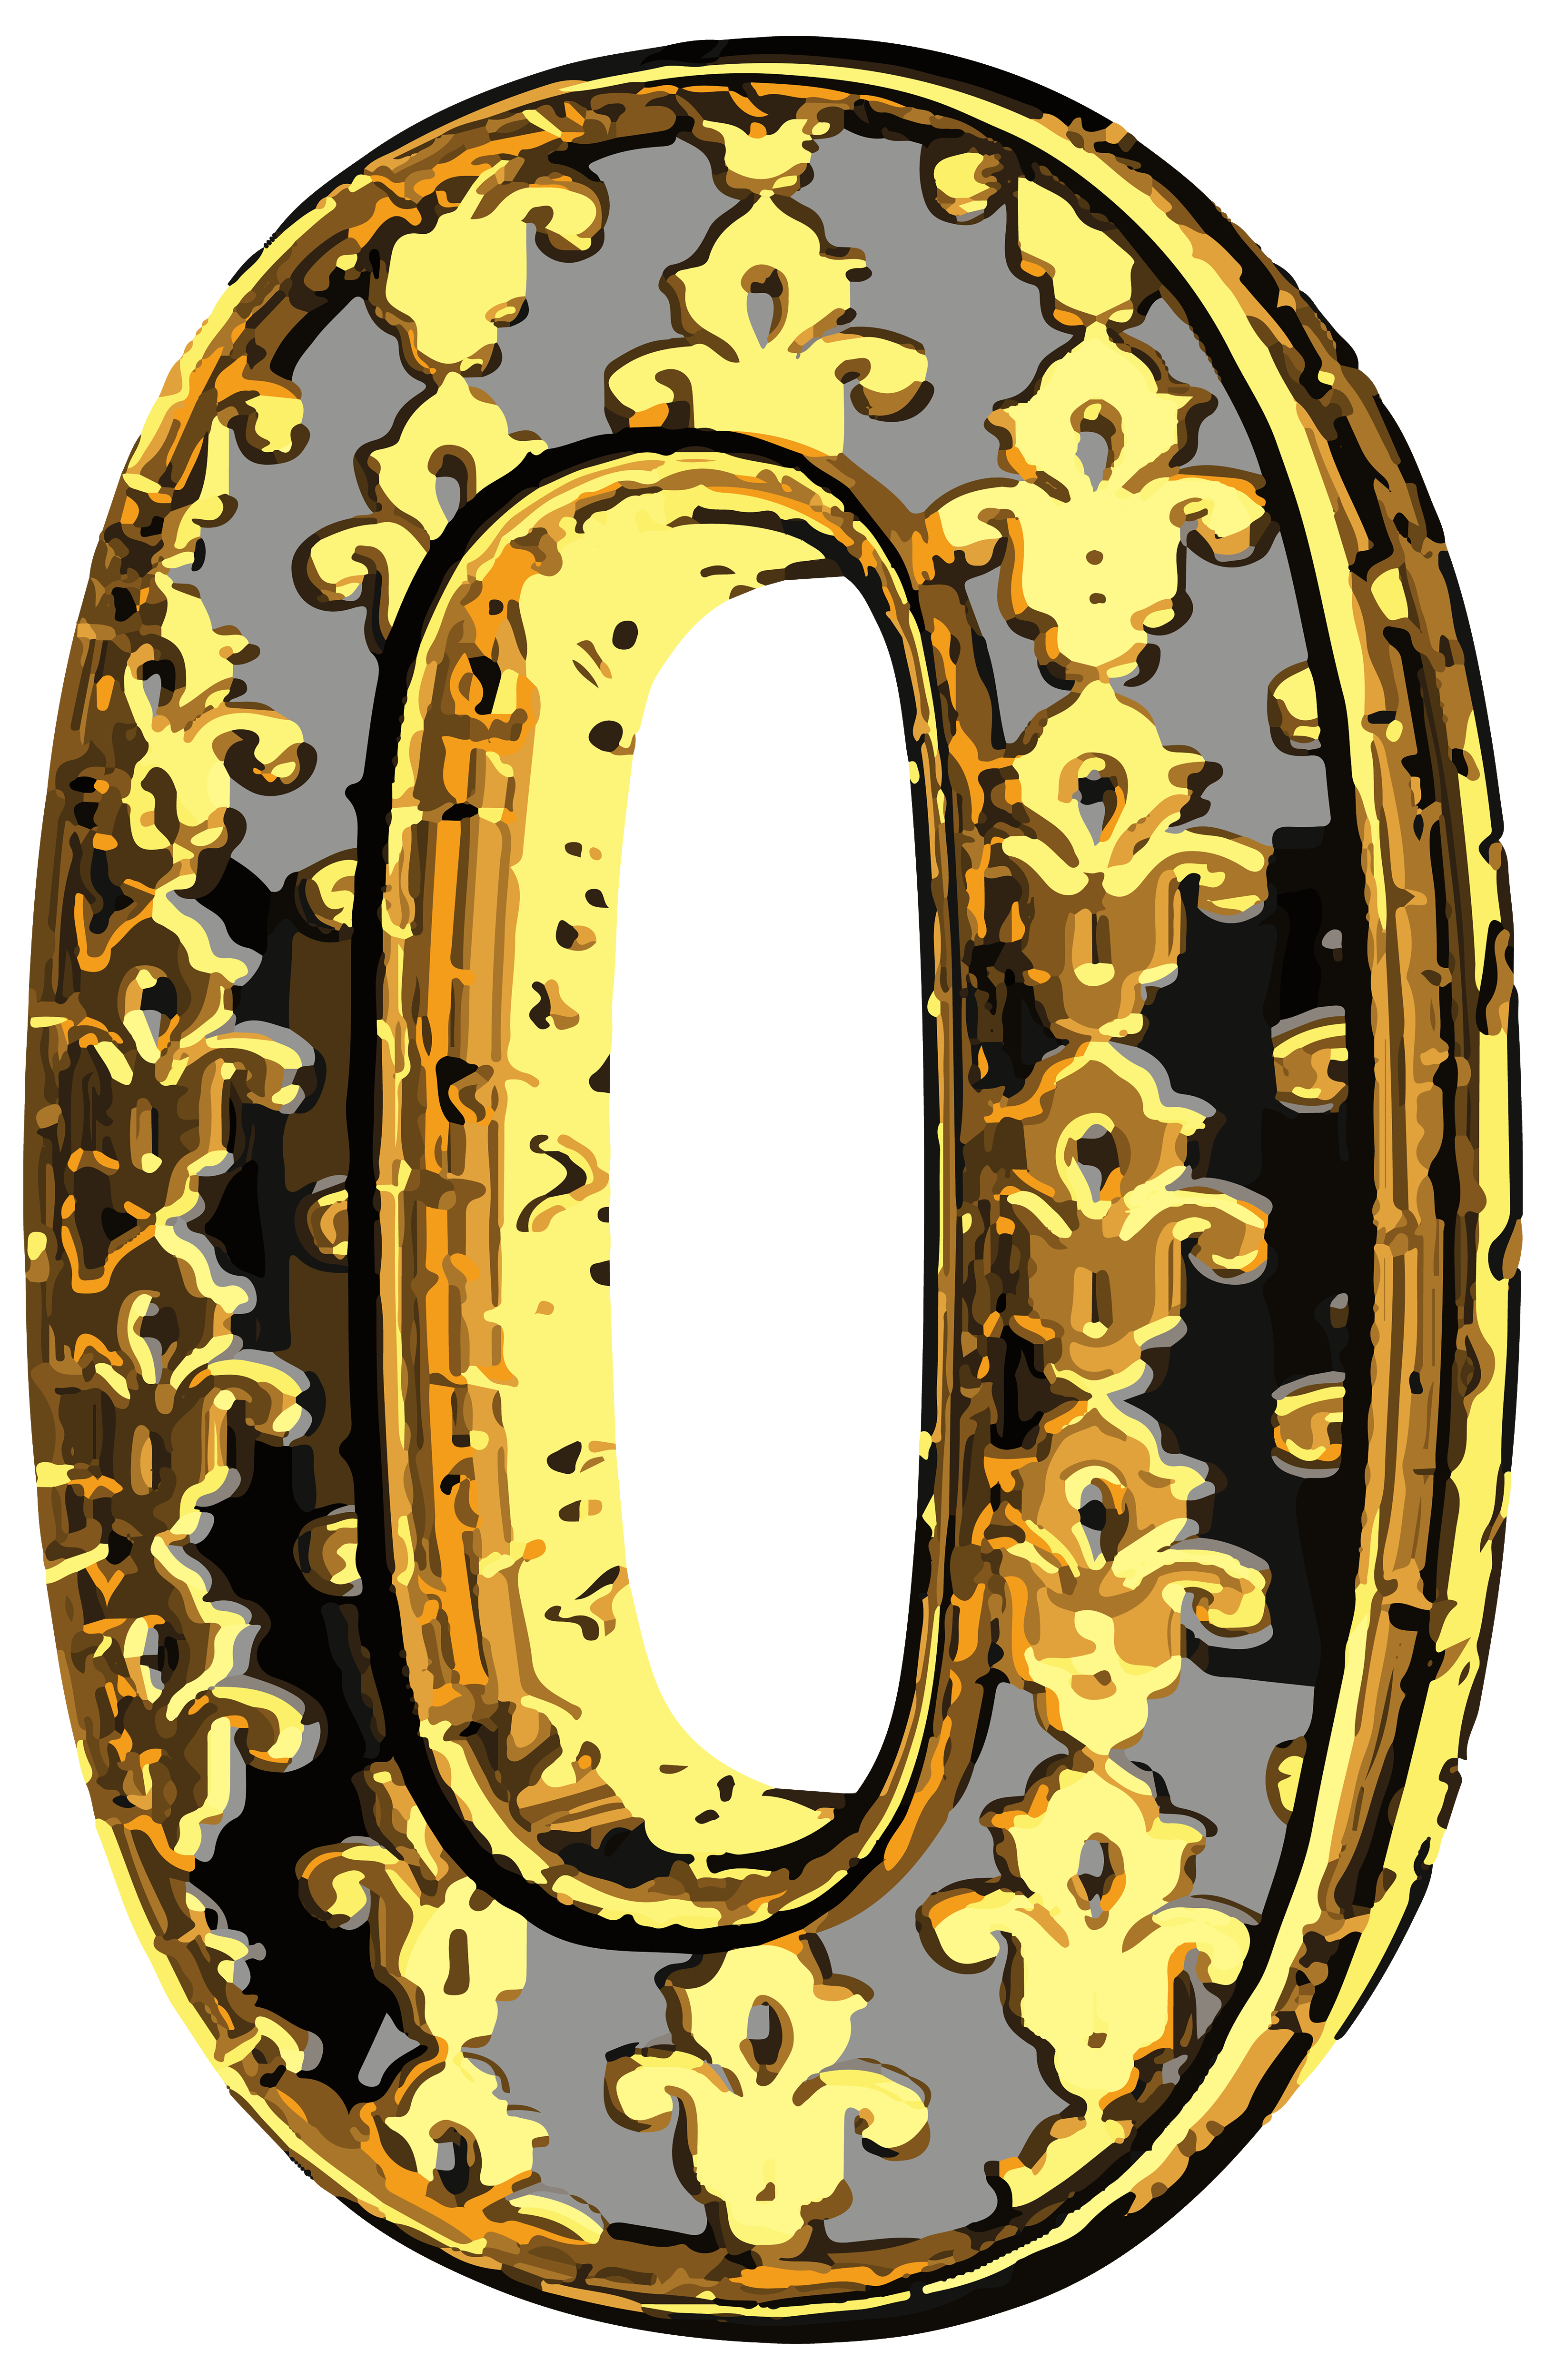 horseshoe clipart vintage